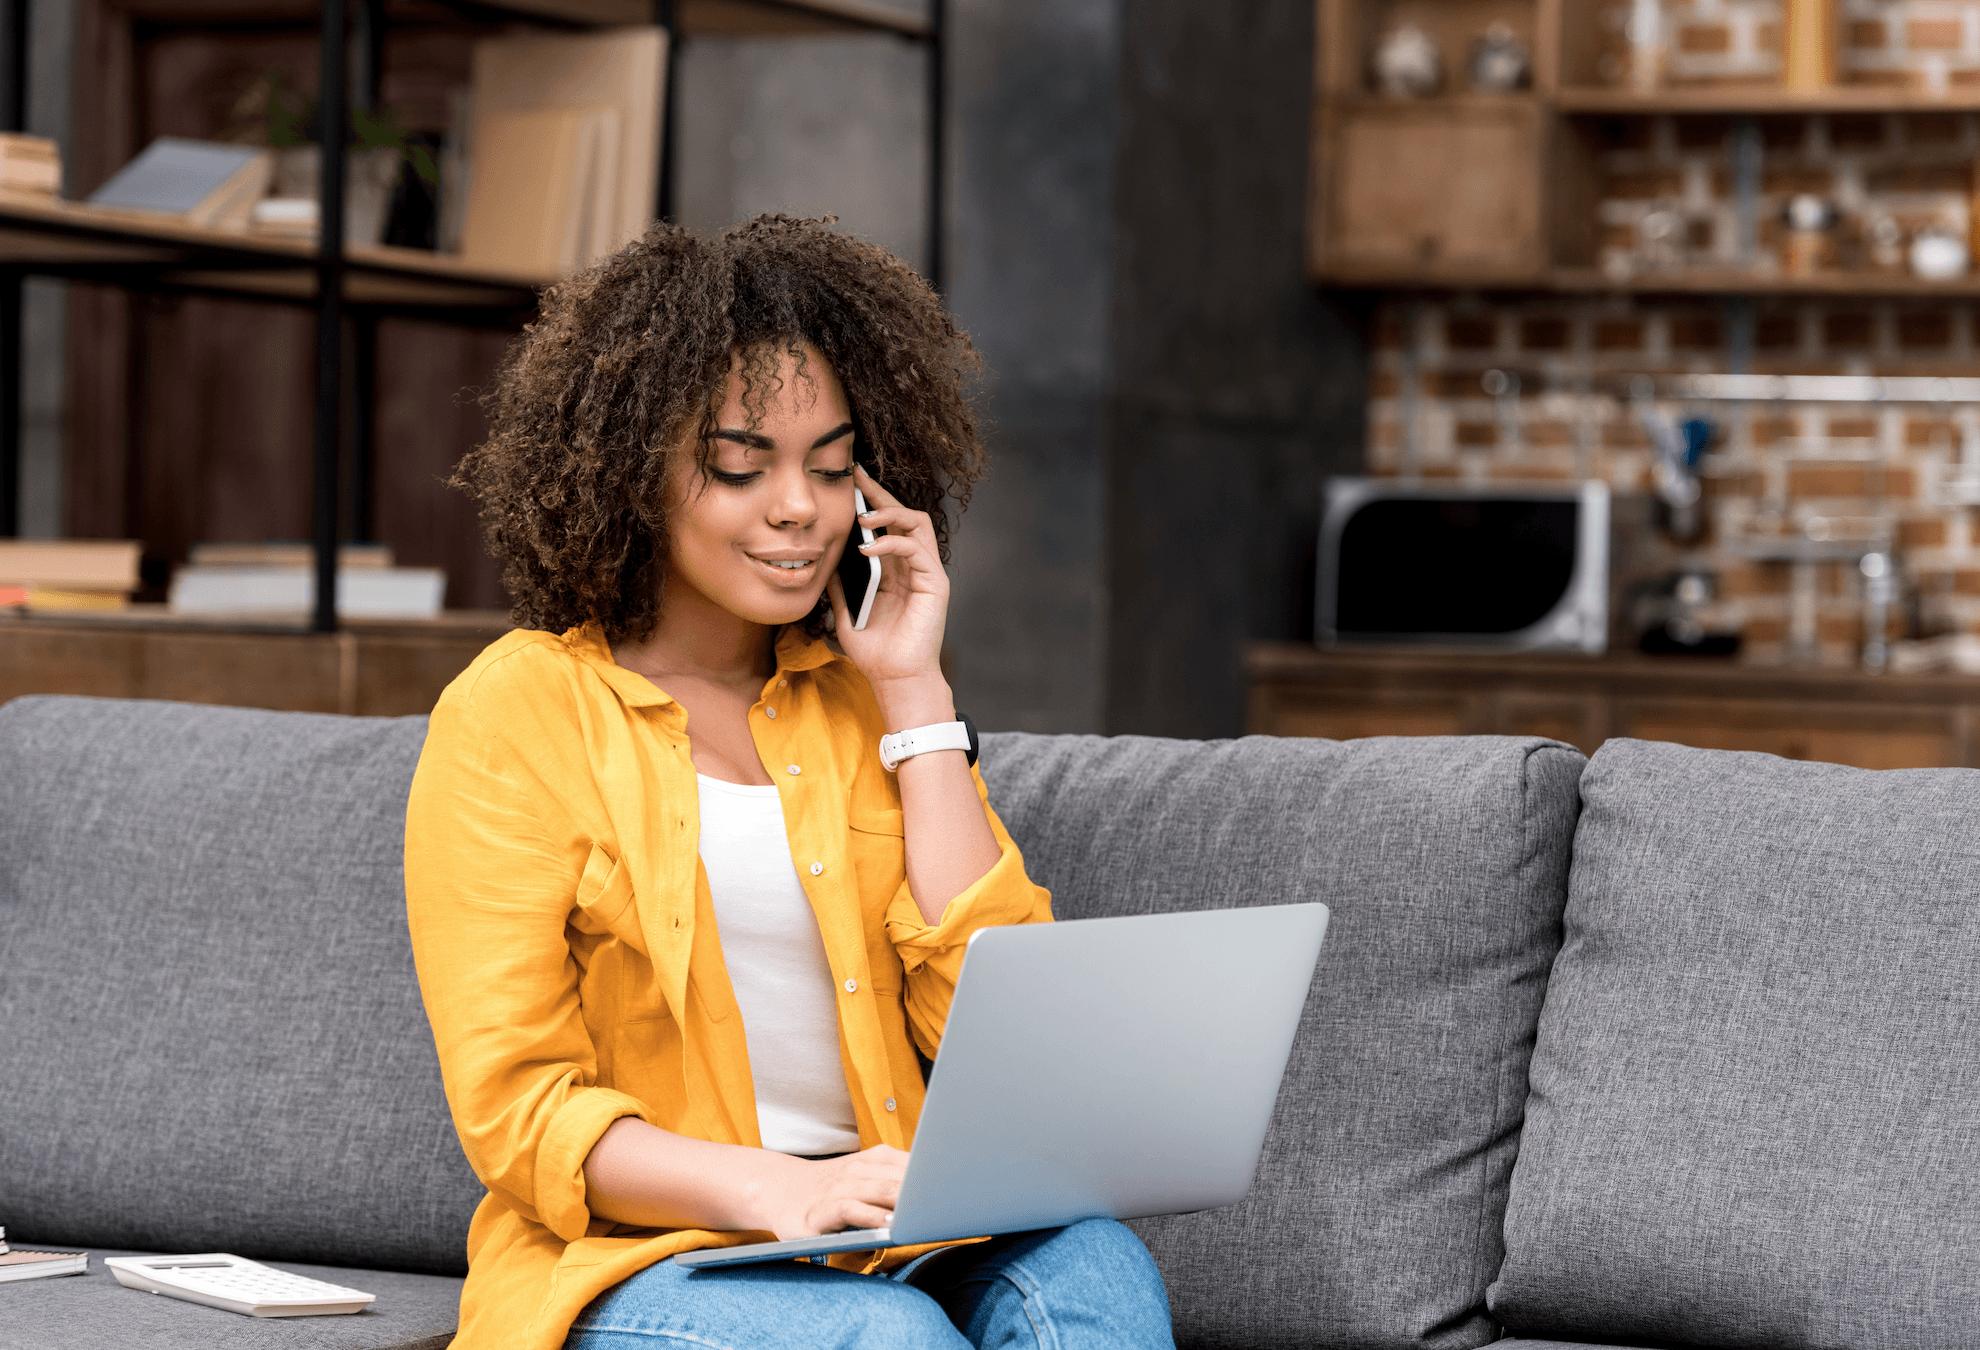 5 Keys to a Secure Remote Work Program